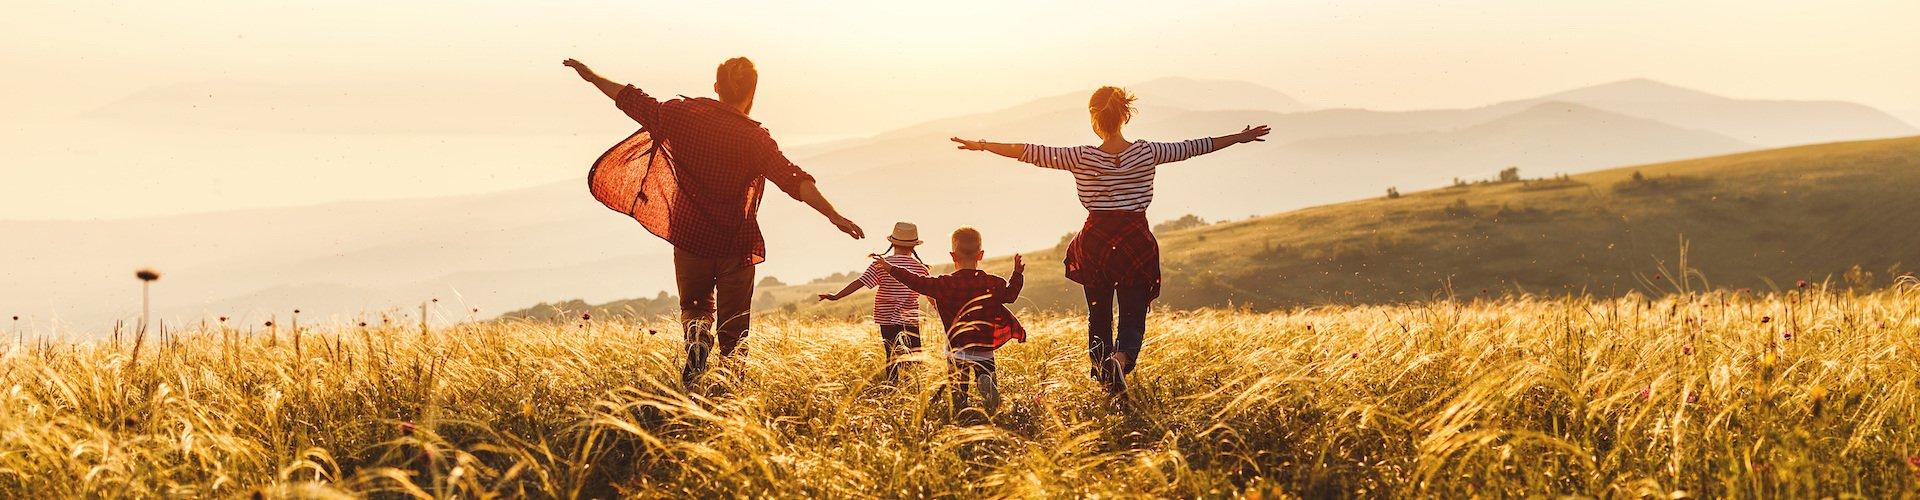 reisemagazin club family urlaubstrends